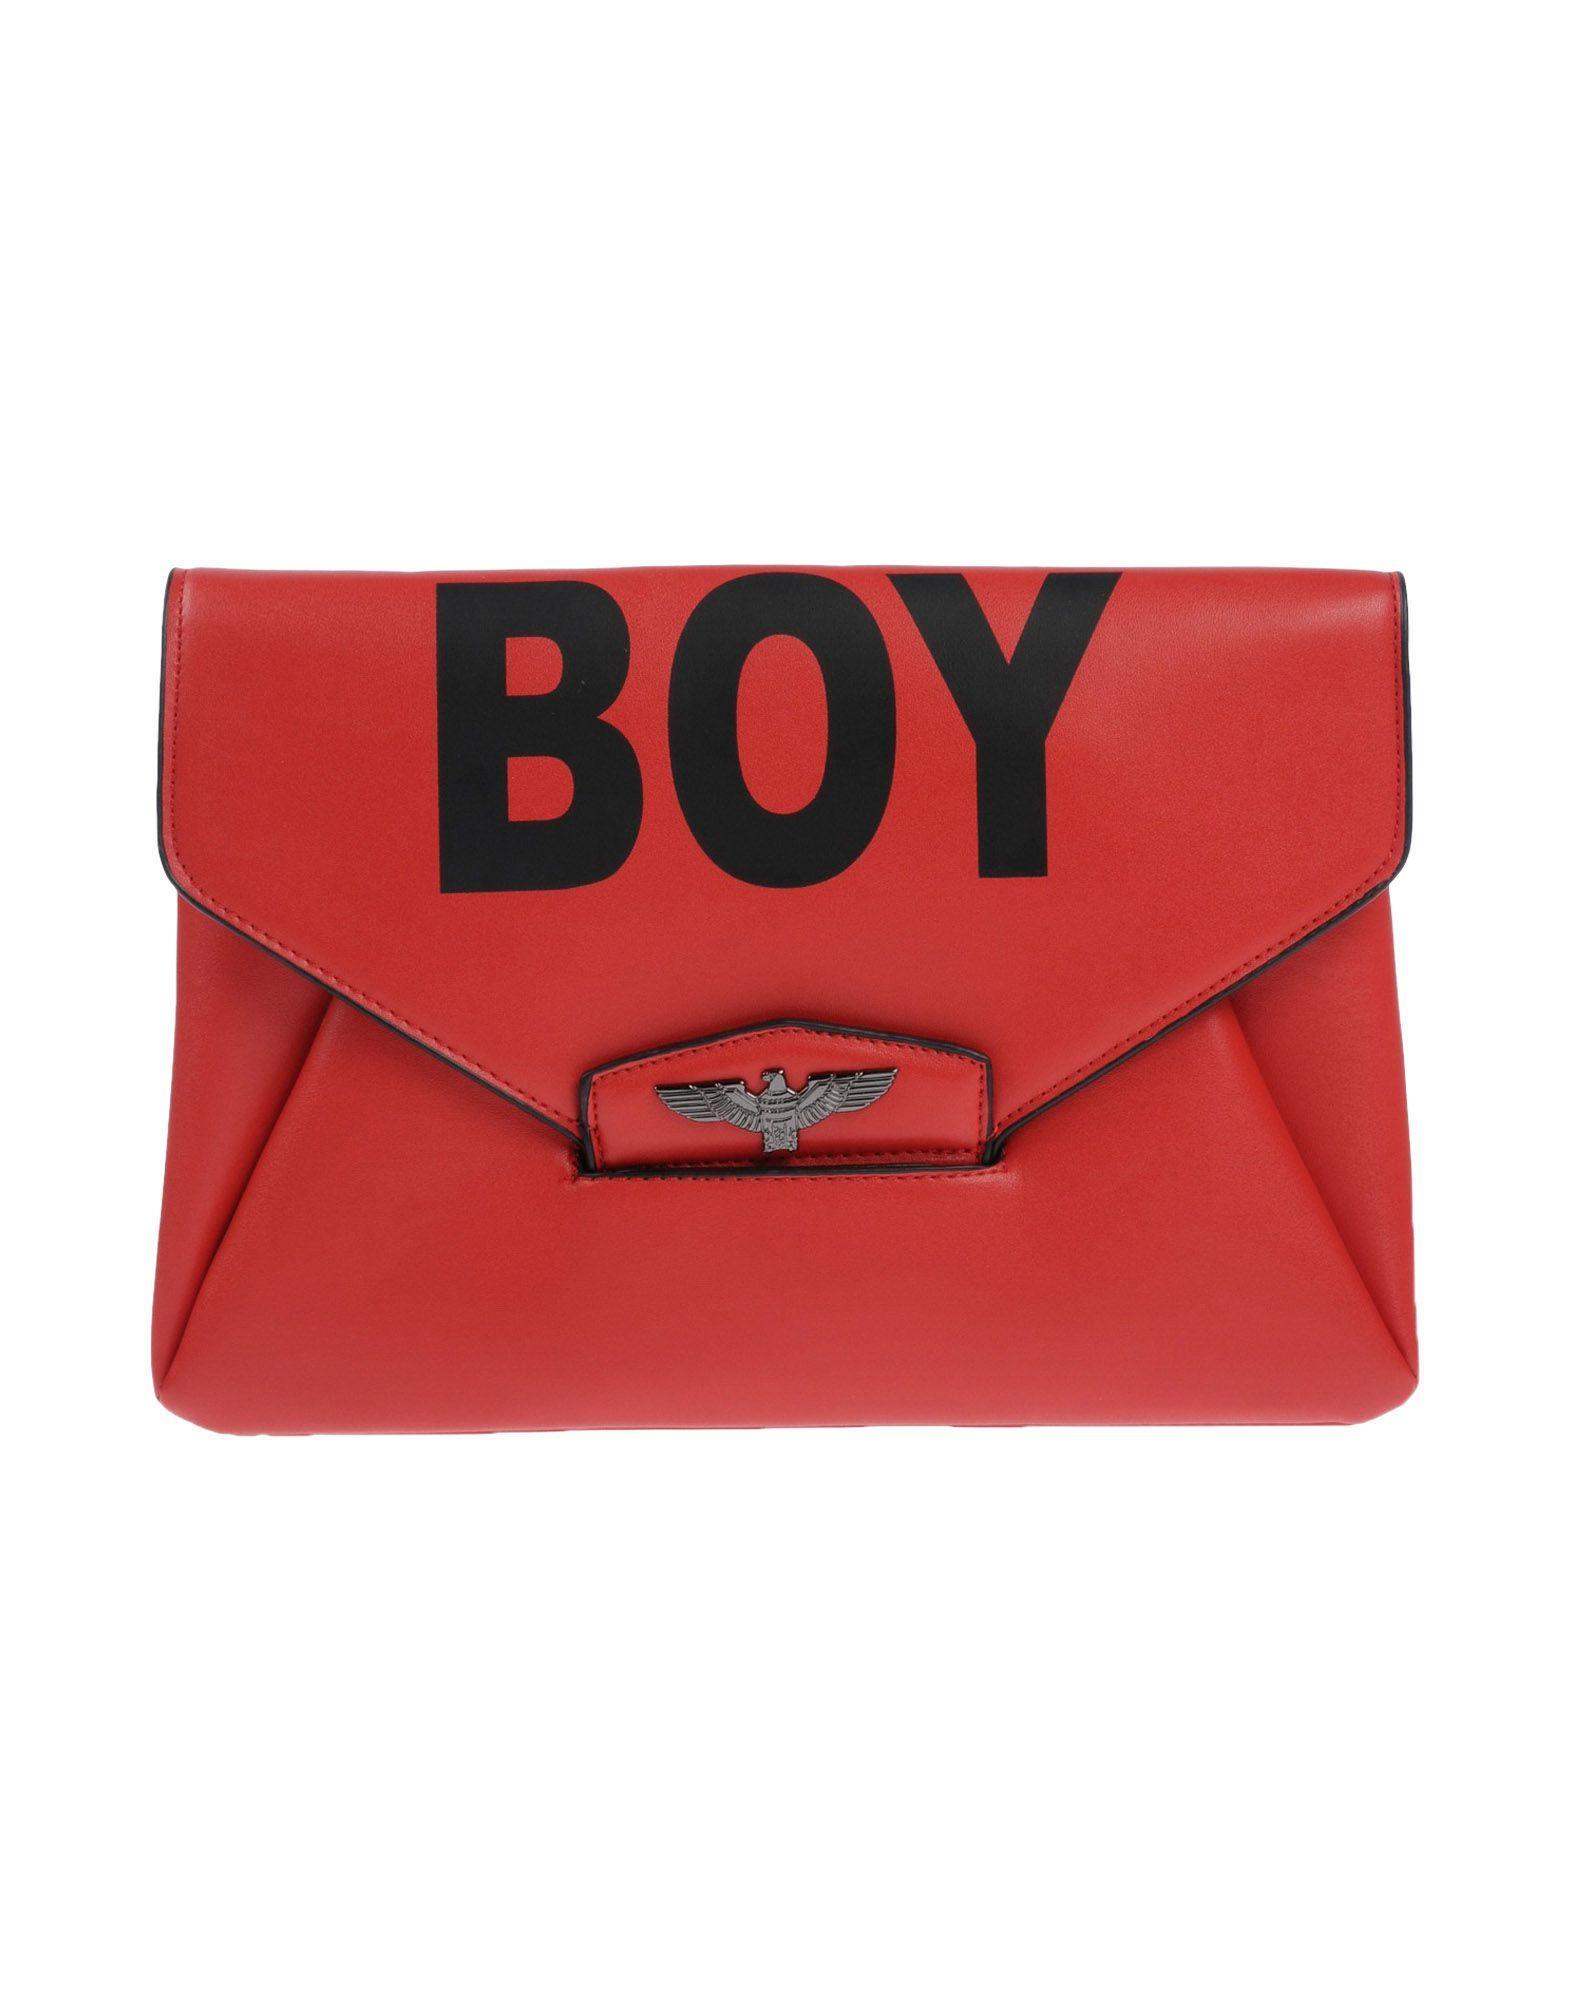 Boy London Handbags In Red